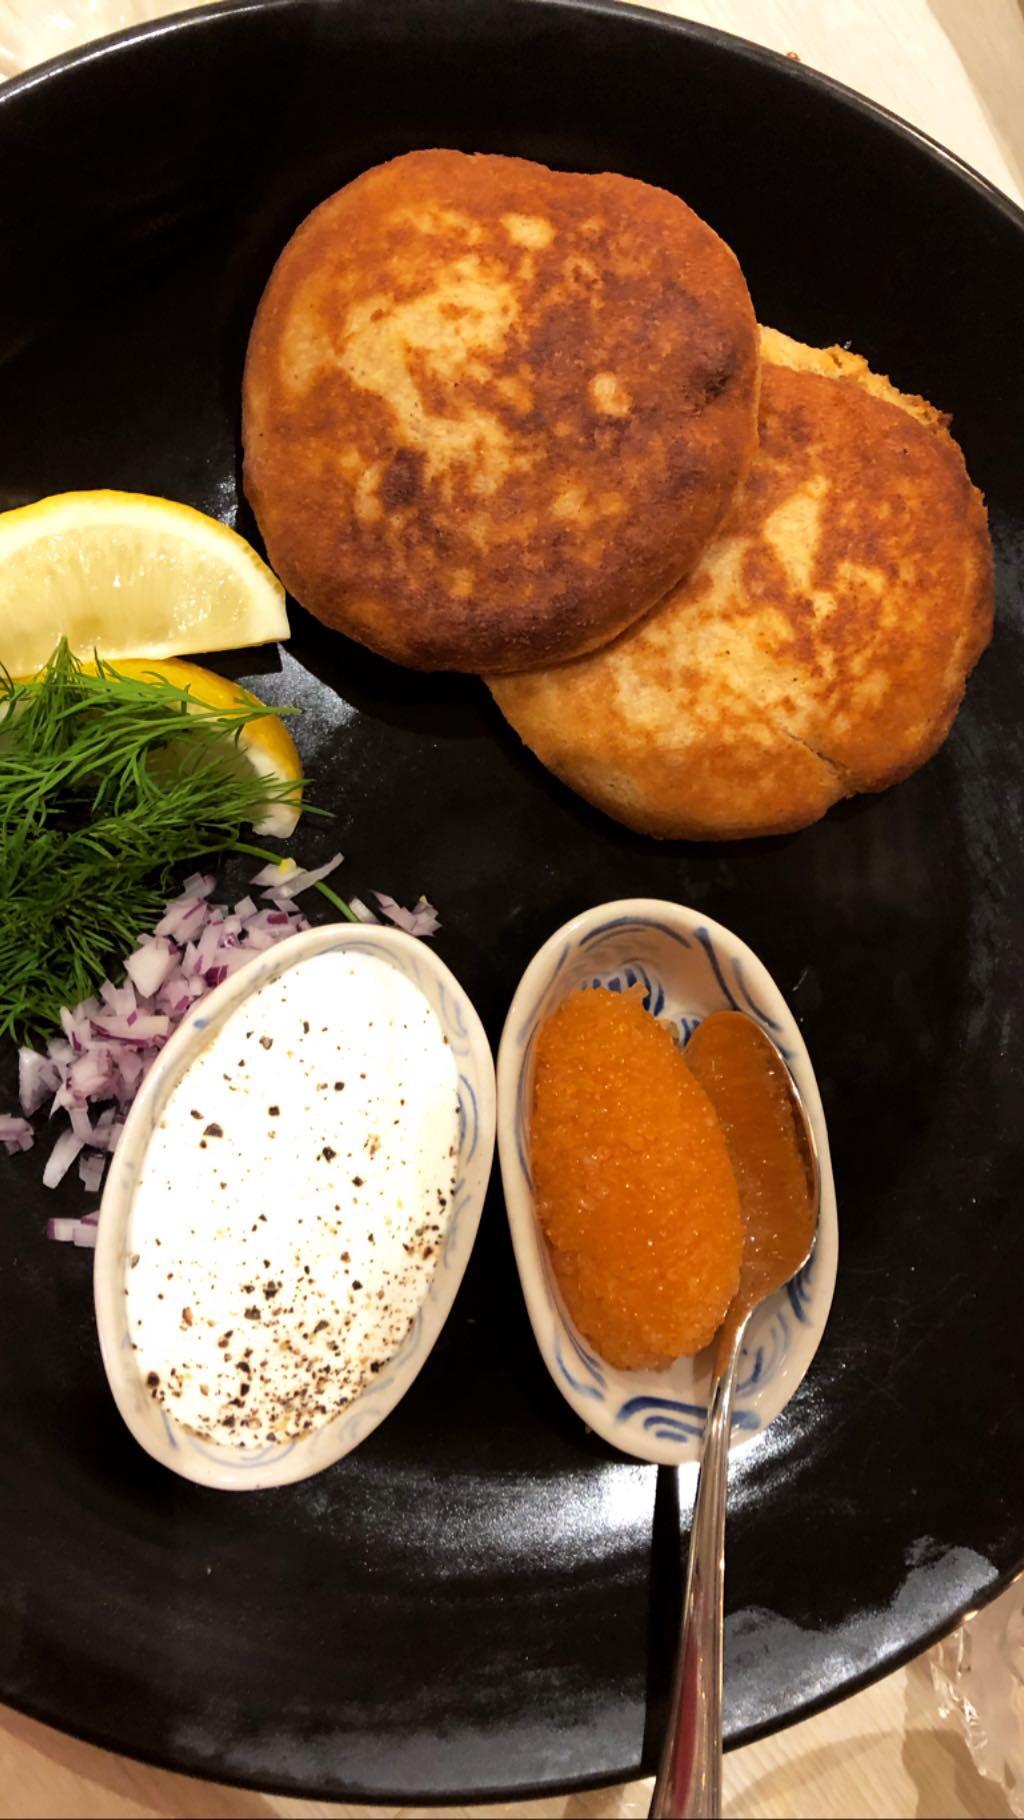 ravintola-moon-blinis-starters